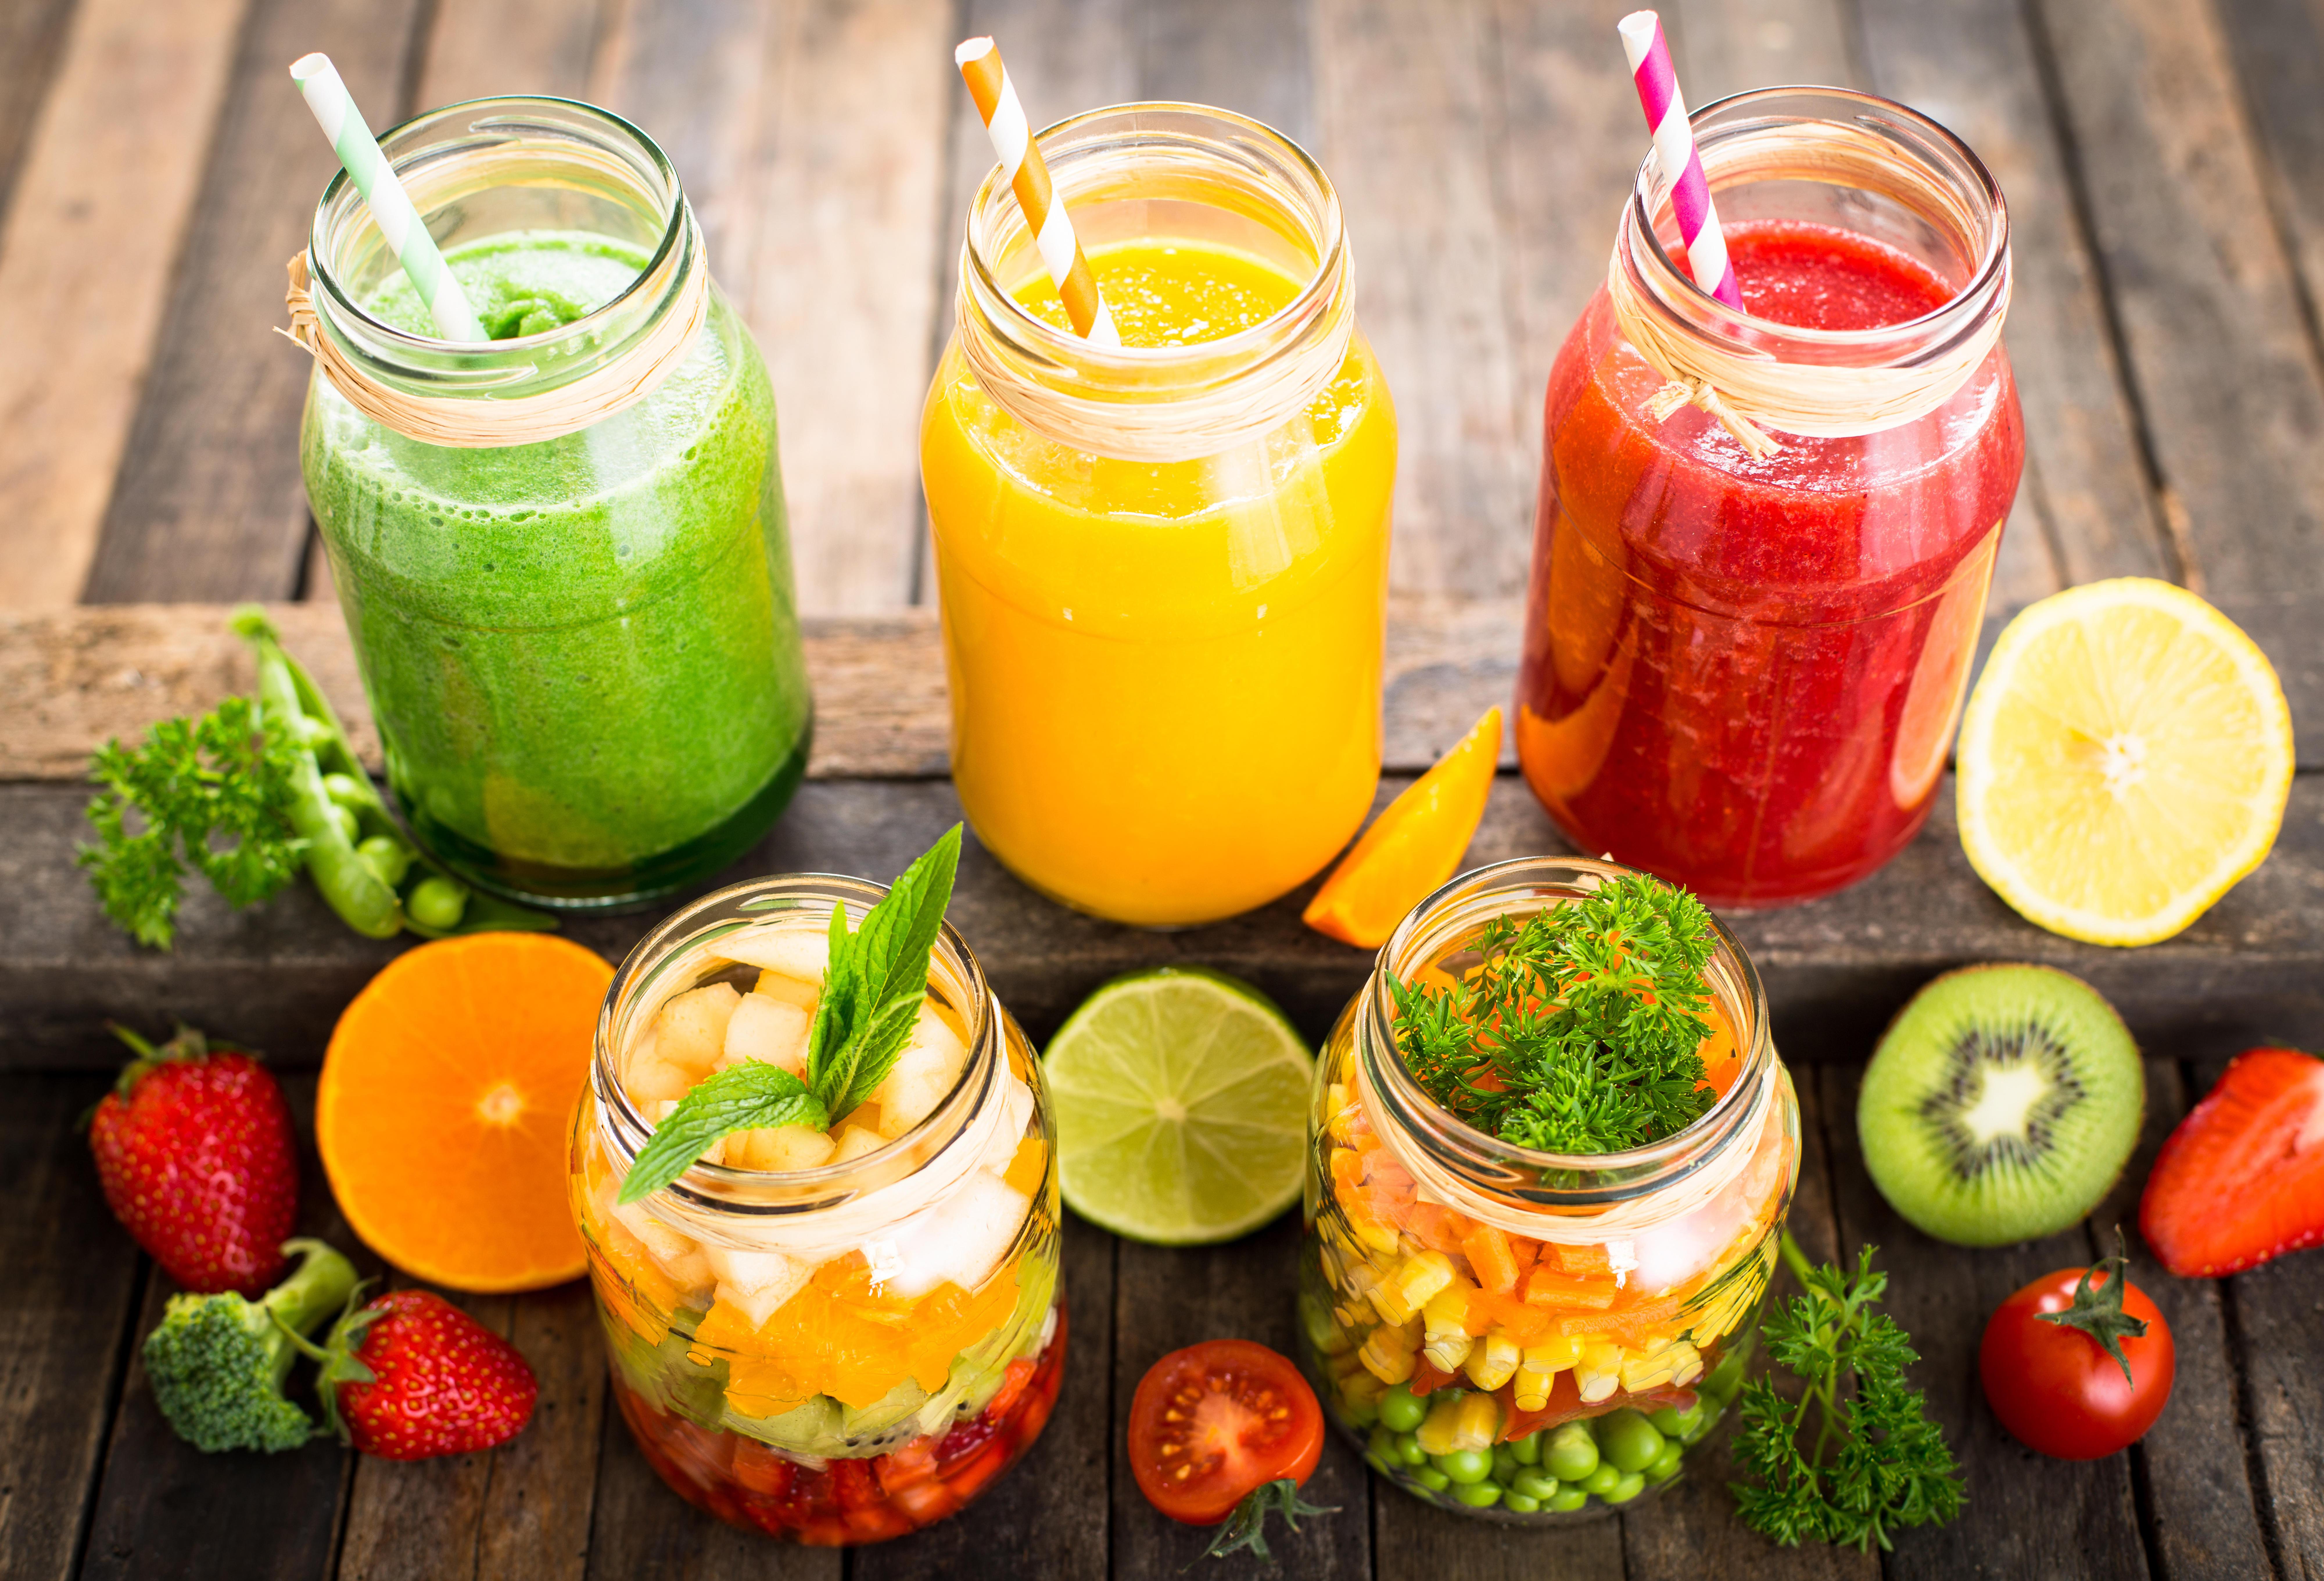 фрукты, ягоды, салаты